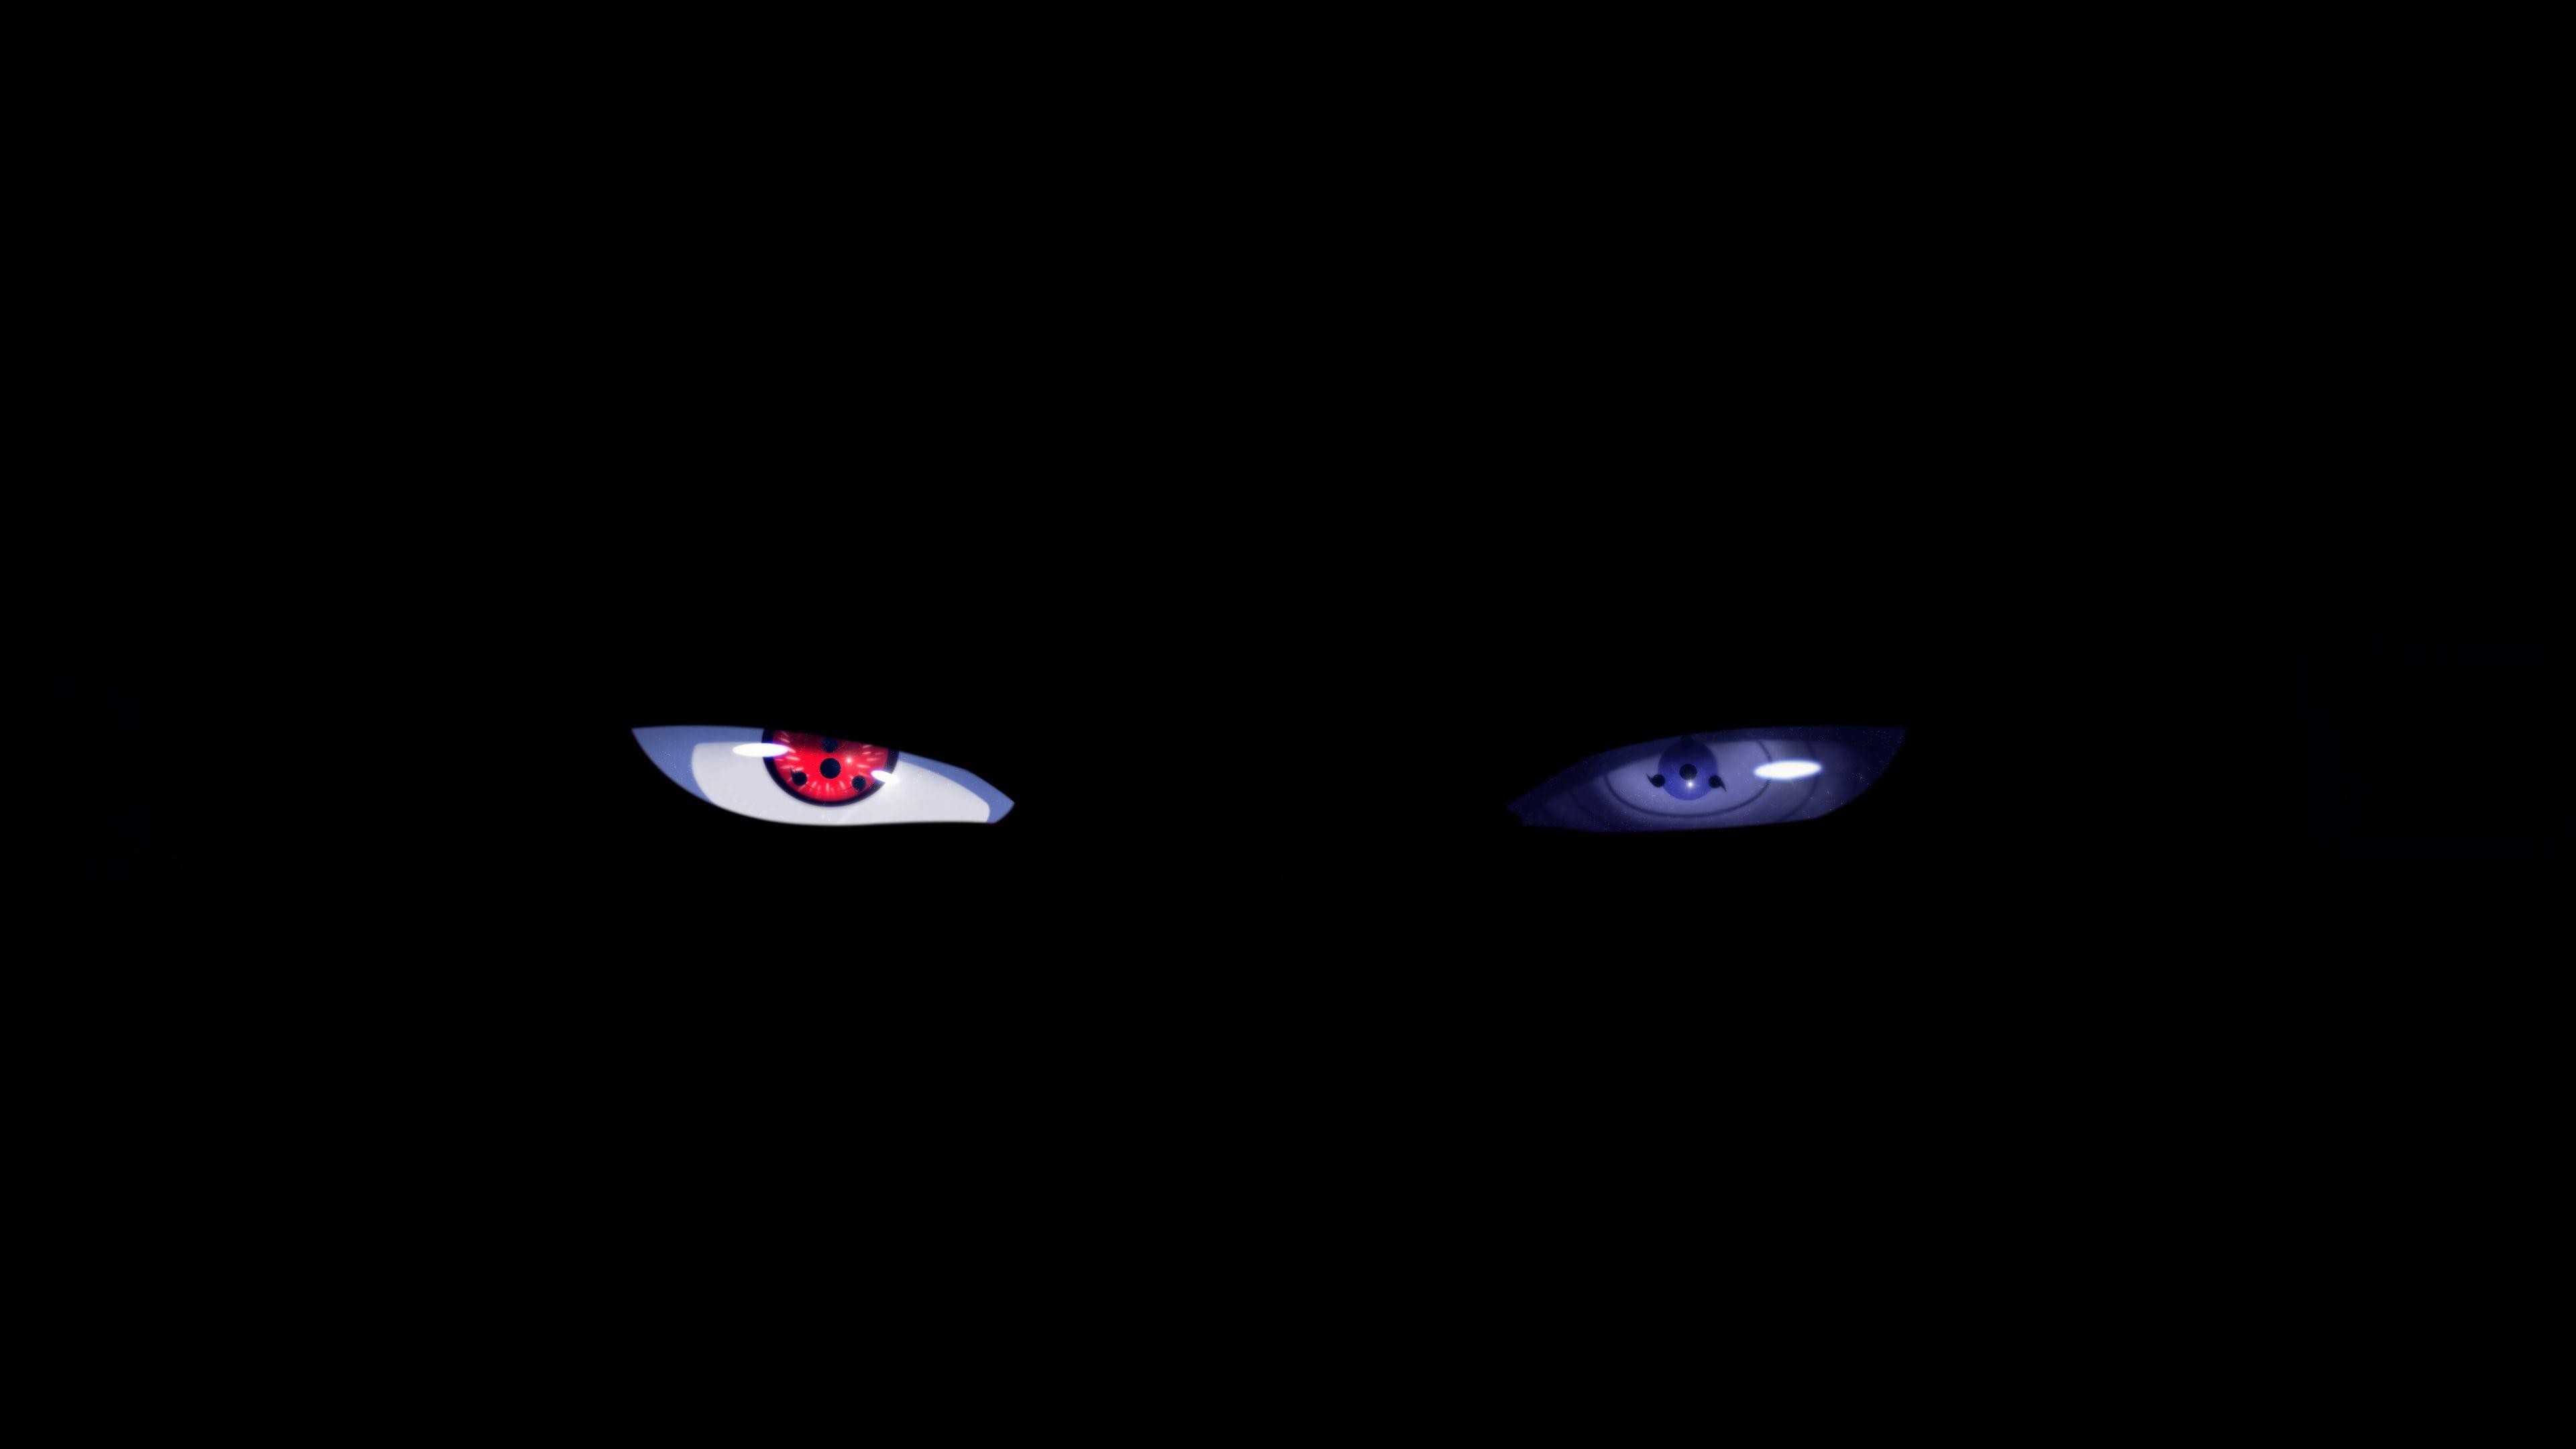 Uchiha Sasuke Sharingan Rinnegan Naruto Shippuuden 4k Wallpaper Hdwallpaper Desktop Sharingan Wallpapers Itachi Eyes Wallpaper Looking for the best madara uchiha wallpaper hd? uchiha sasuke sharingan rinnegan